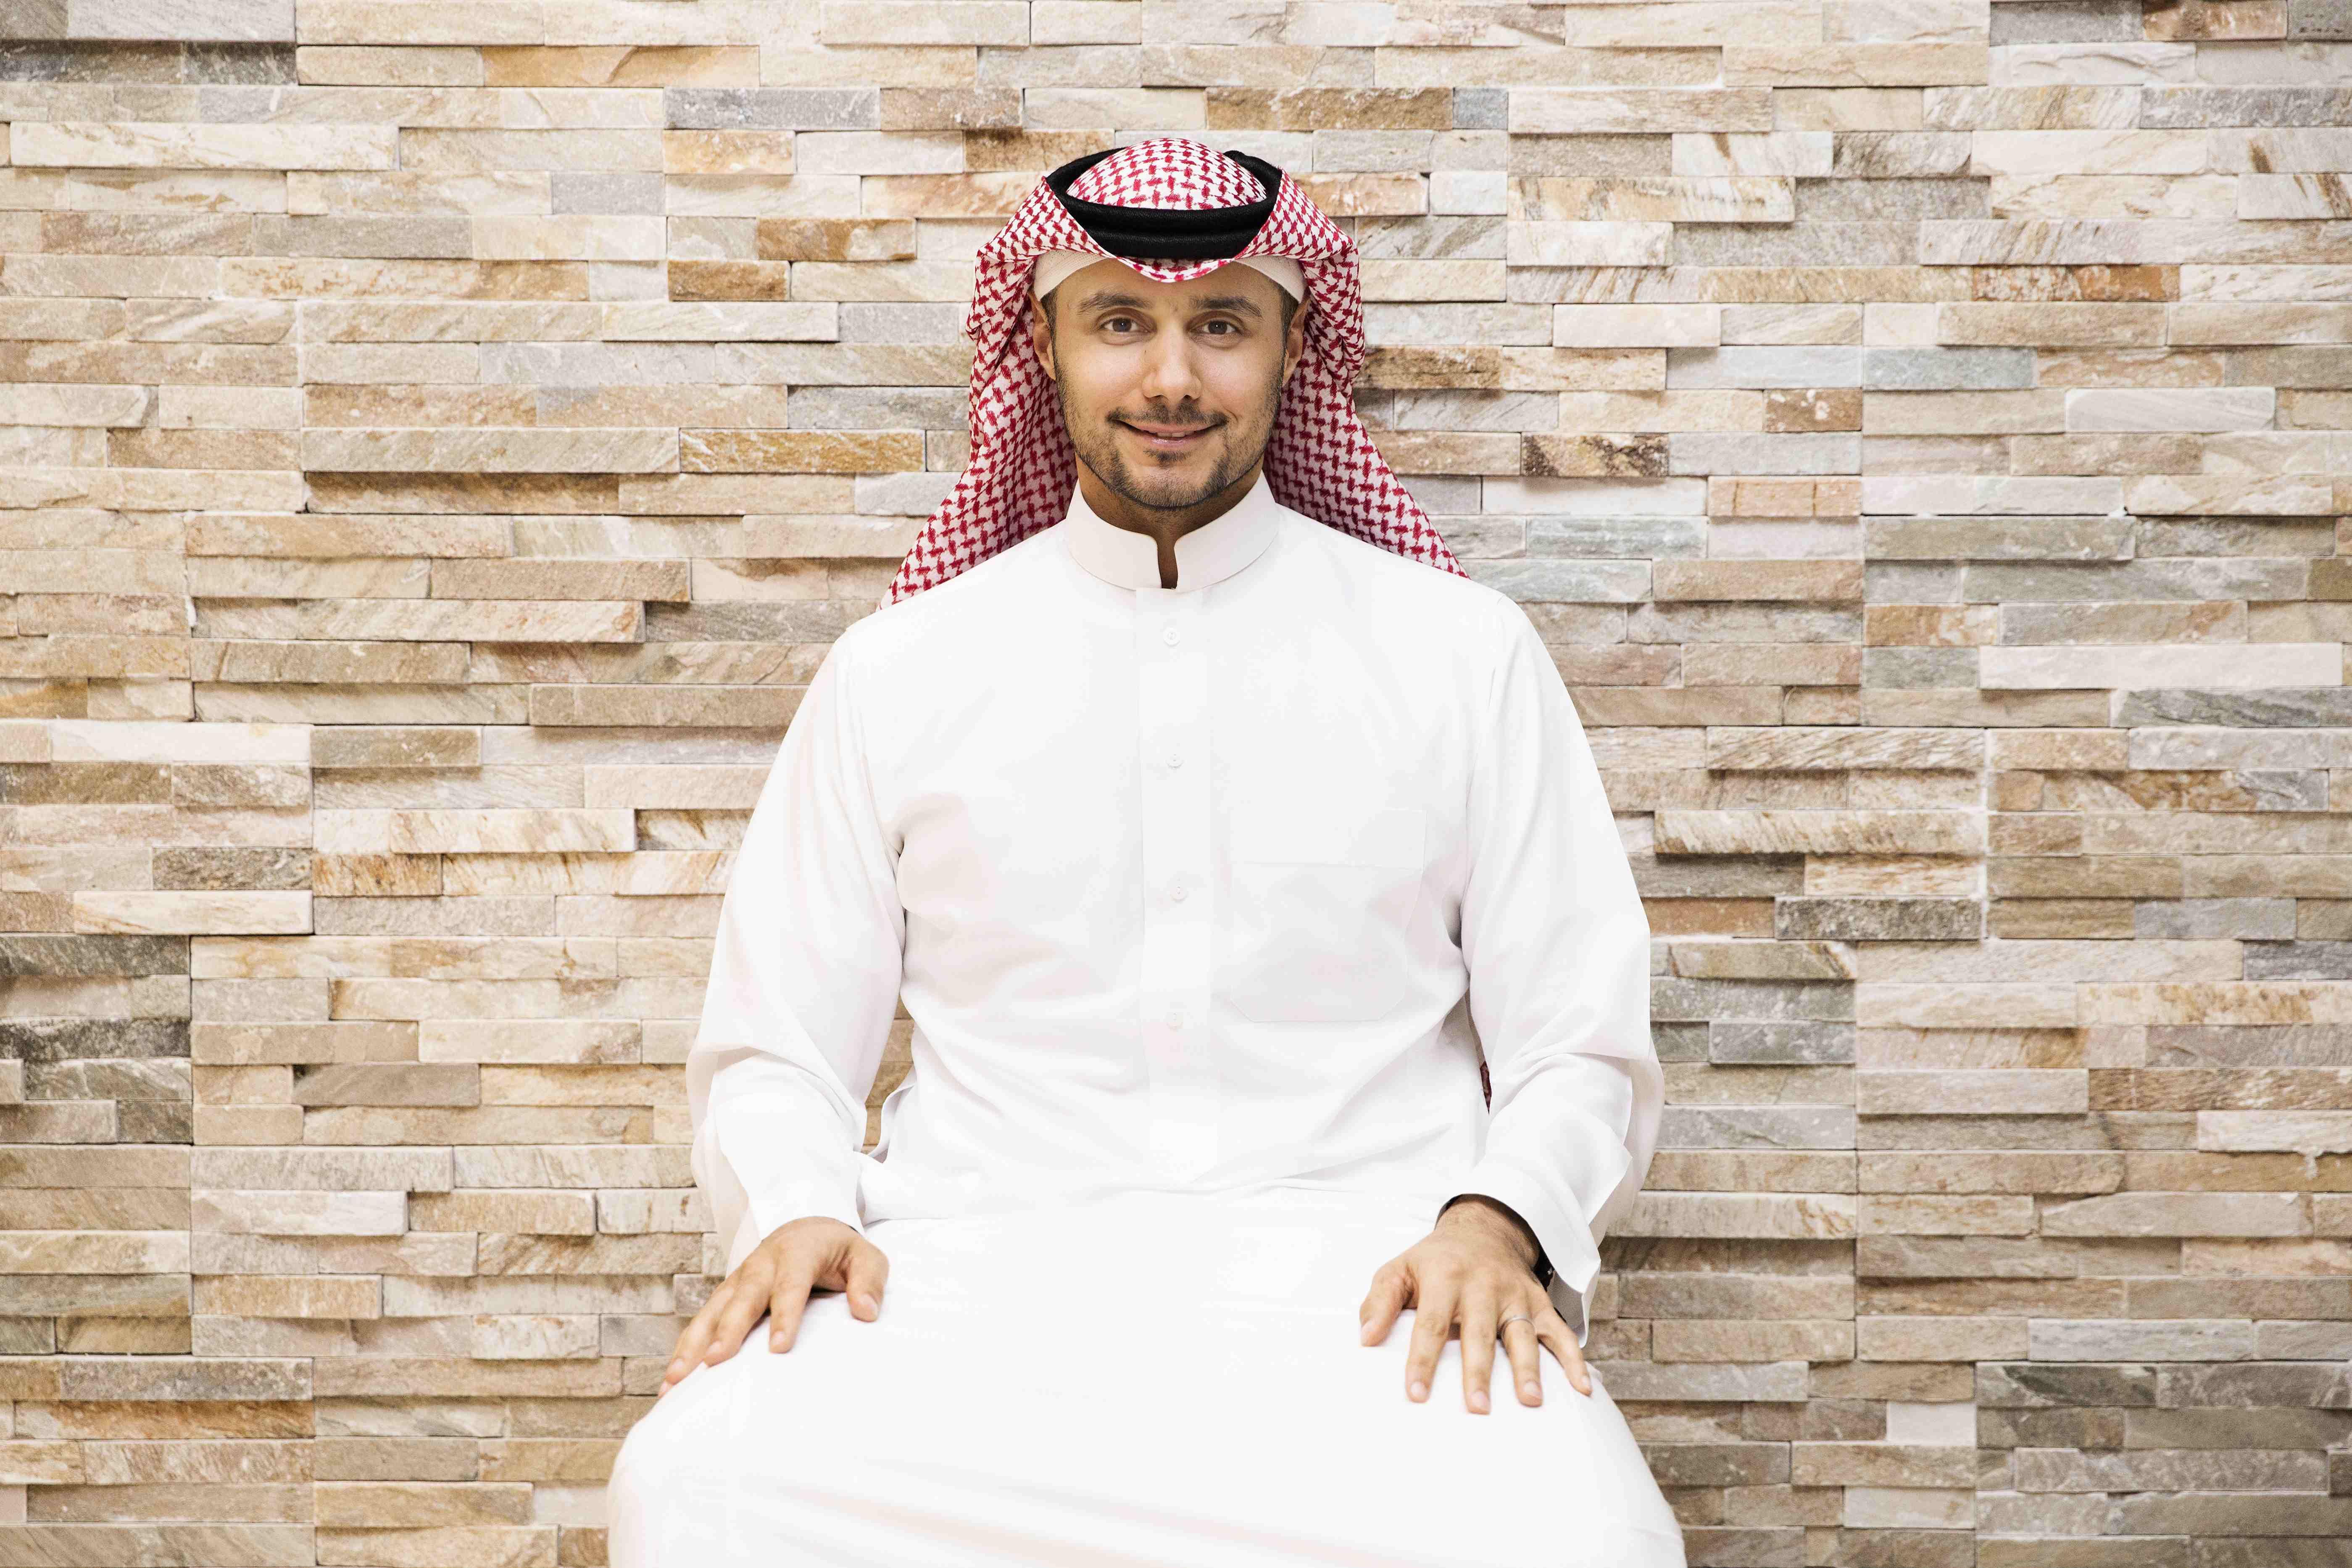 Khaled bin Alwaleed